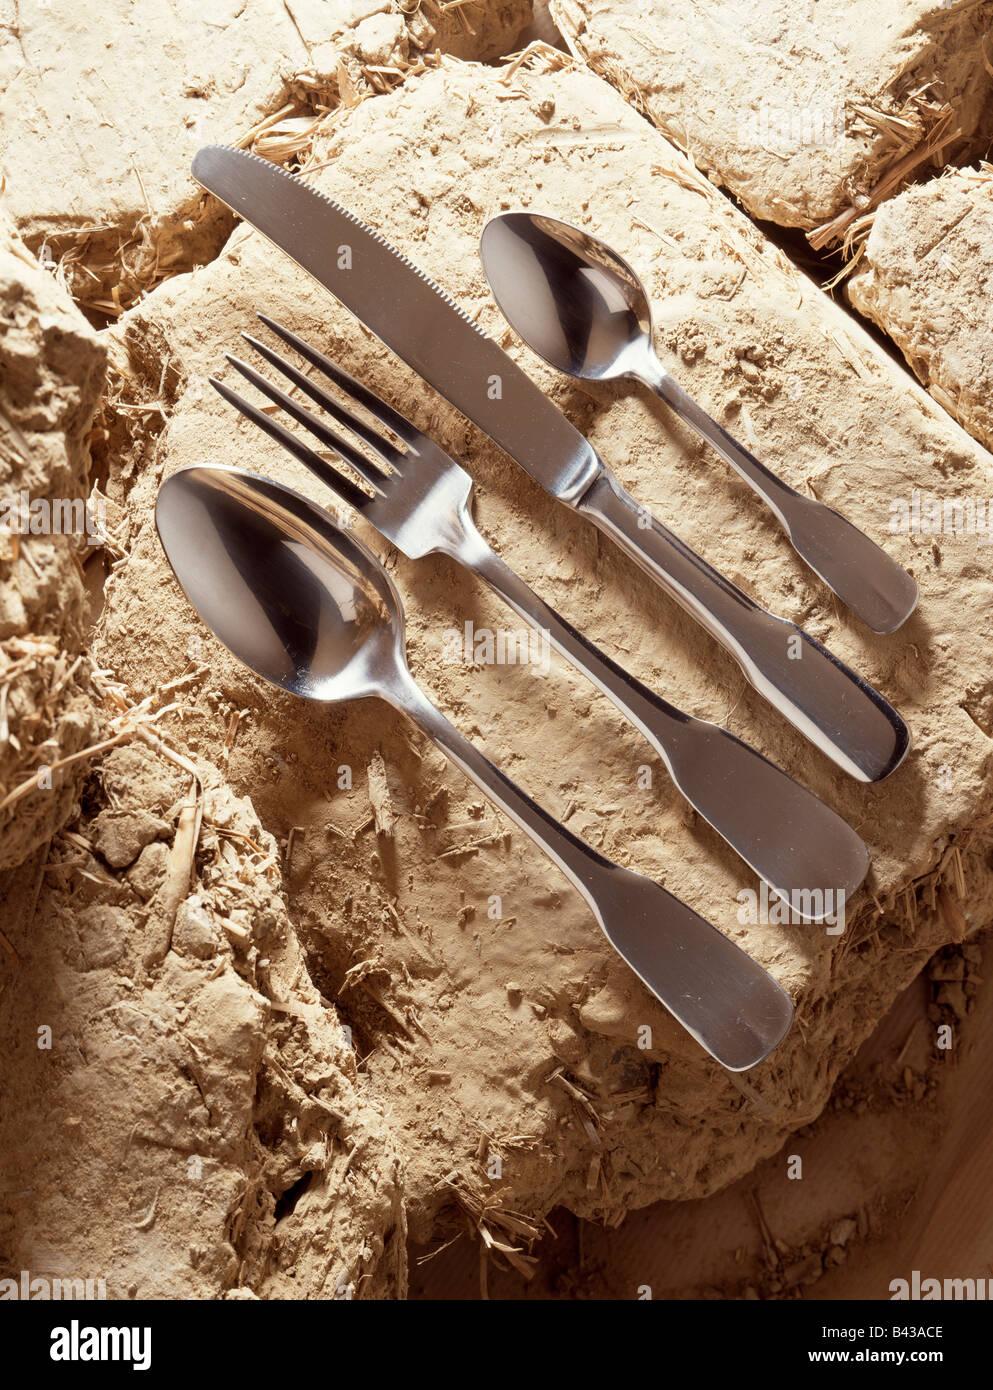 Cutlery on daub - Stock Image